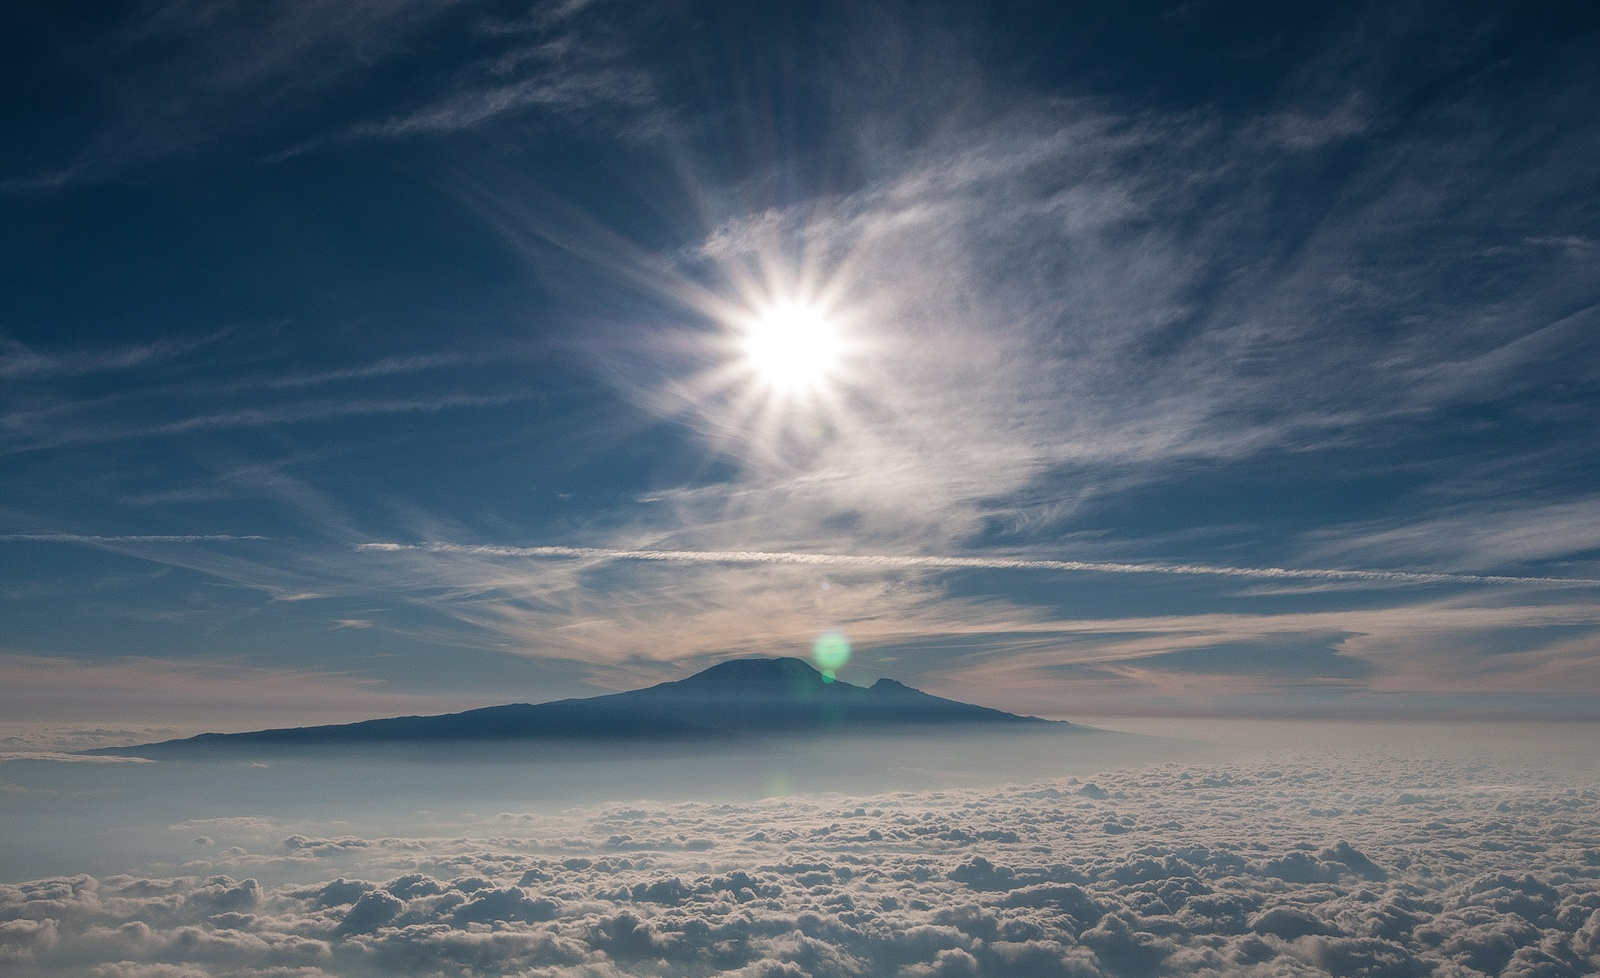 Mt. Kilimanjaro in Tanzania above the clouds